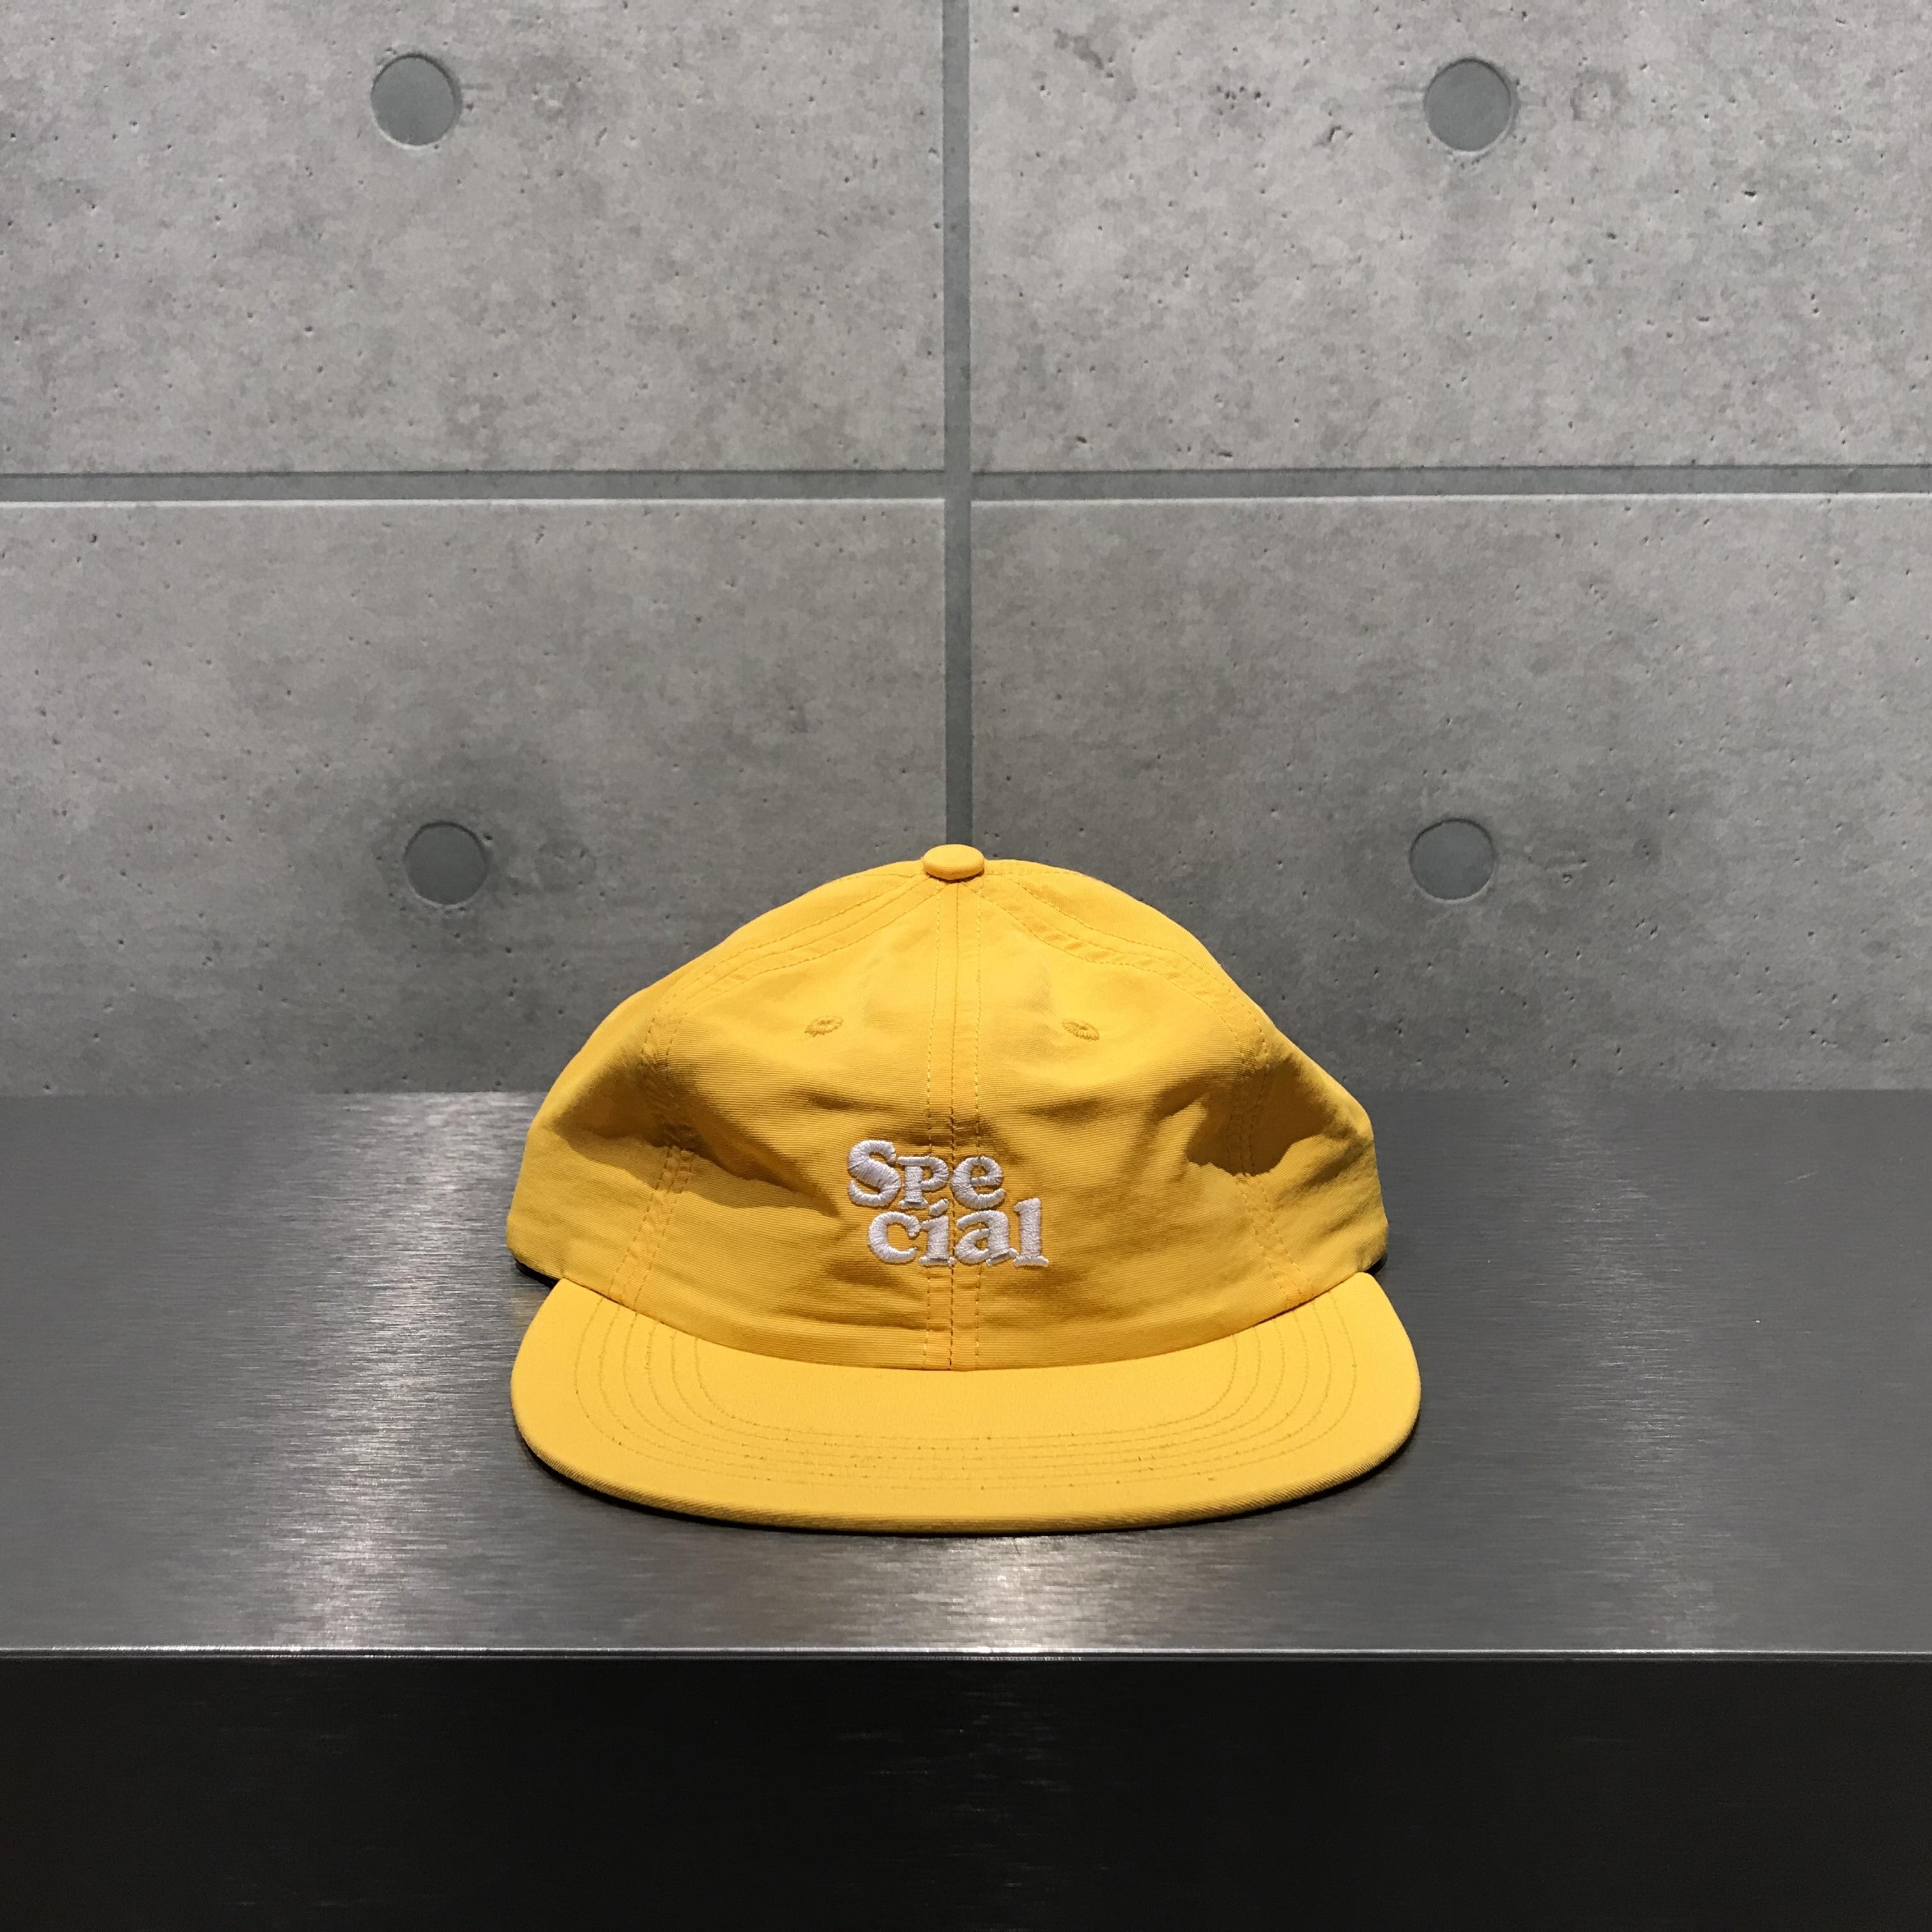 NOTHIN'SPECIAL SPECIAL NYLON 6-PANEL CAP / YELLOW x WHITE